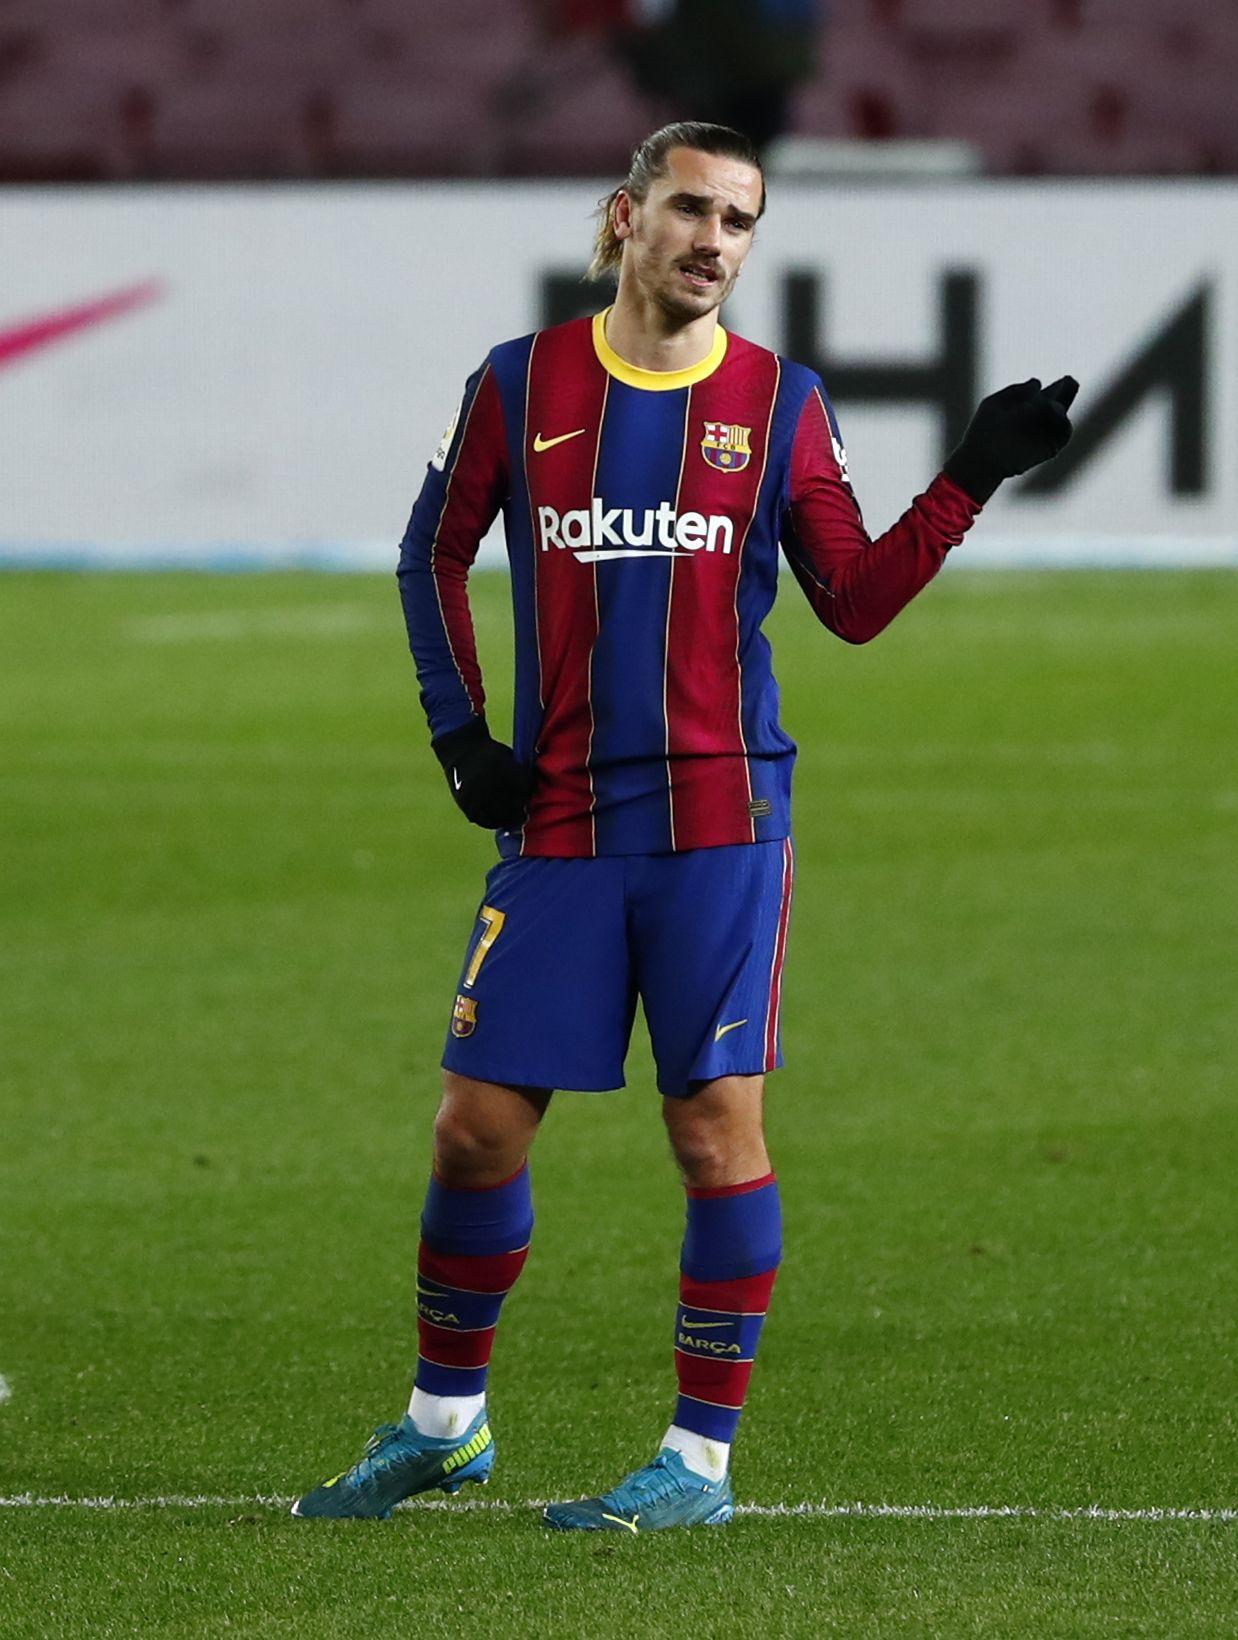 Barcelona's Antoine Griezmann gestures during the Spanish La Liga soccer match between Barcelona and Eibar at the Camp Nou stadium in Barcelona in Barcelona, Spain, Tuesday, Dec. 29, 2020. (AP Photo/Joan Monfort)